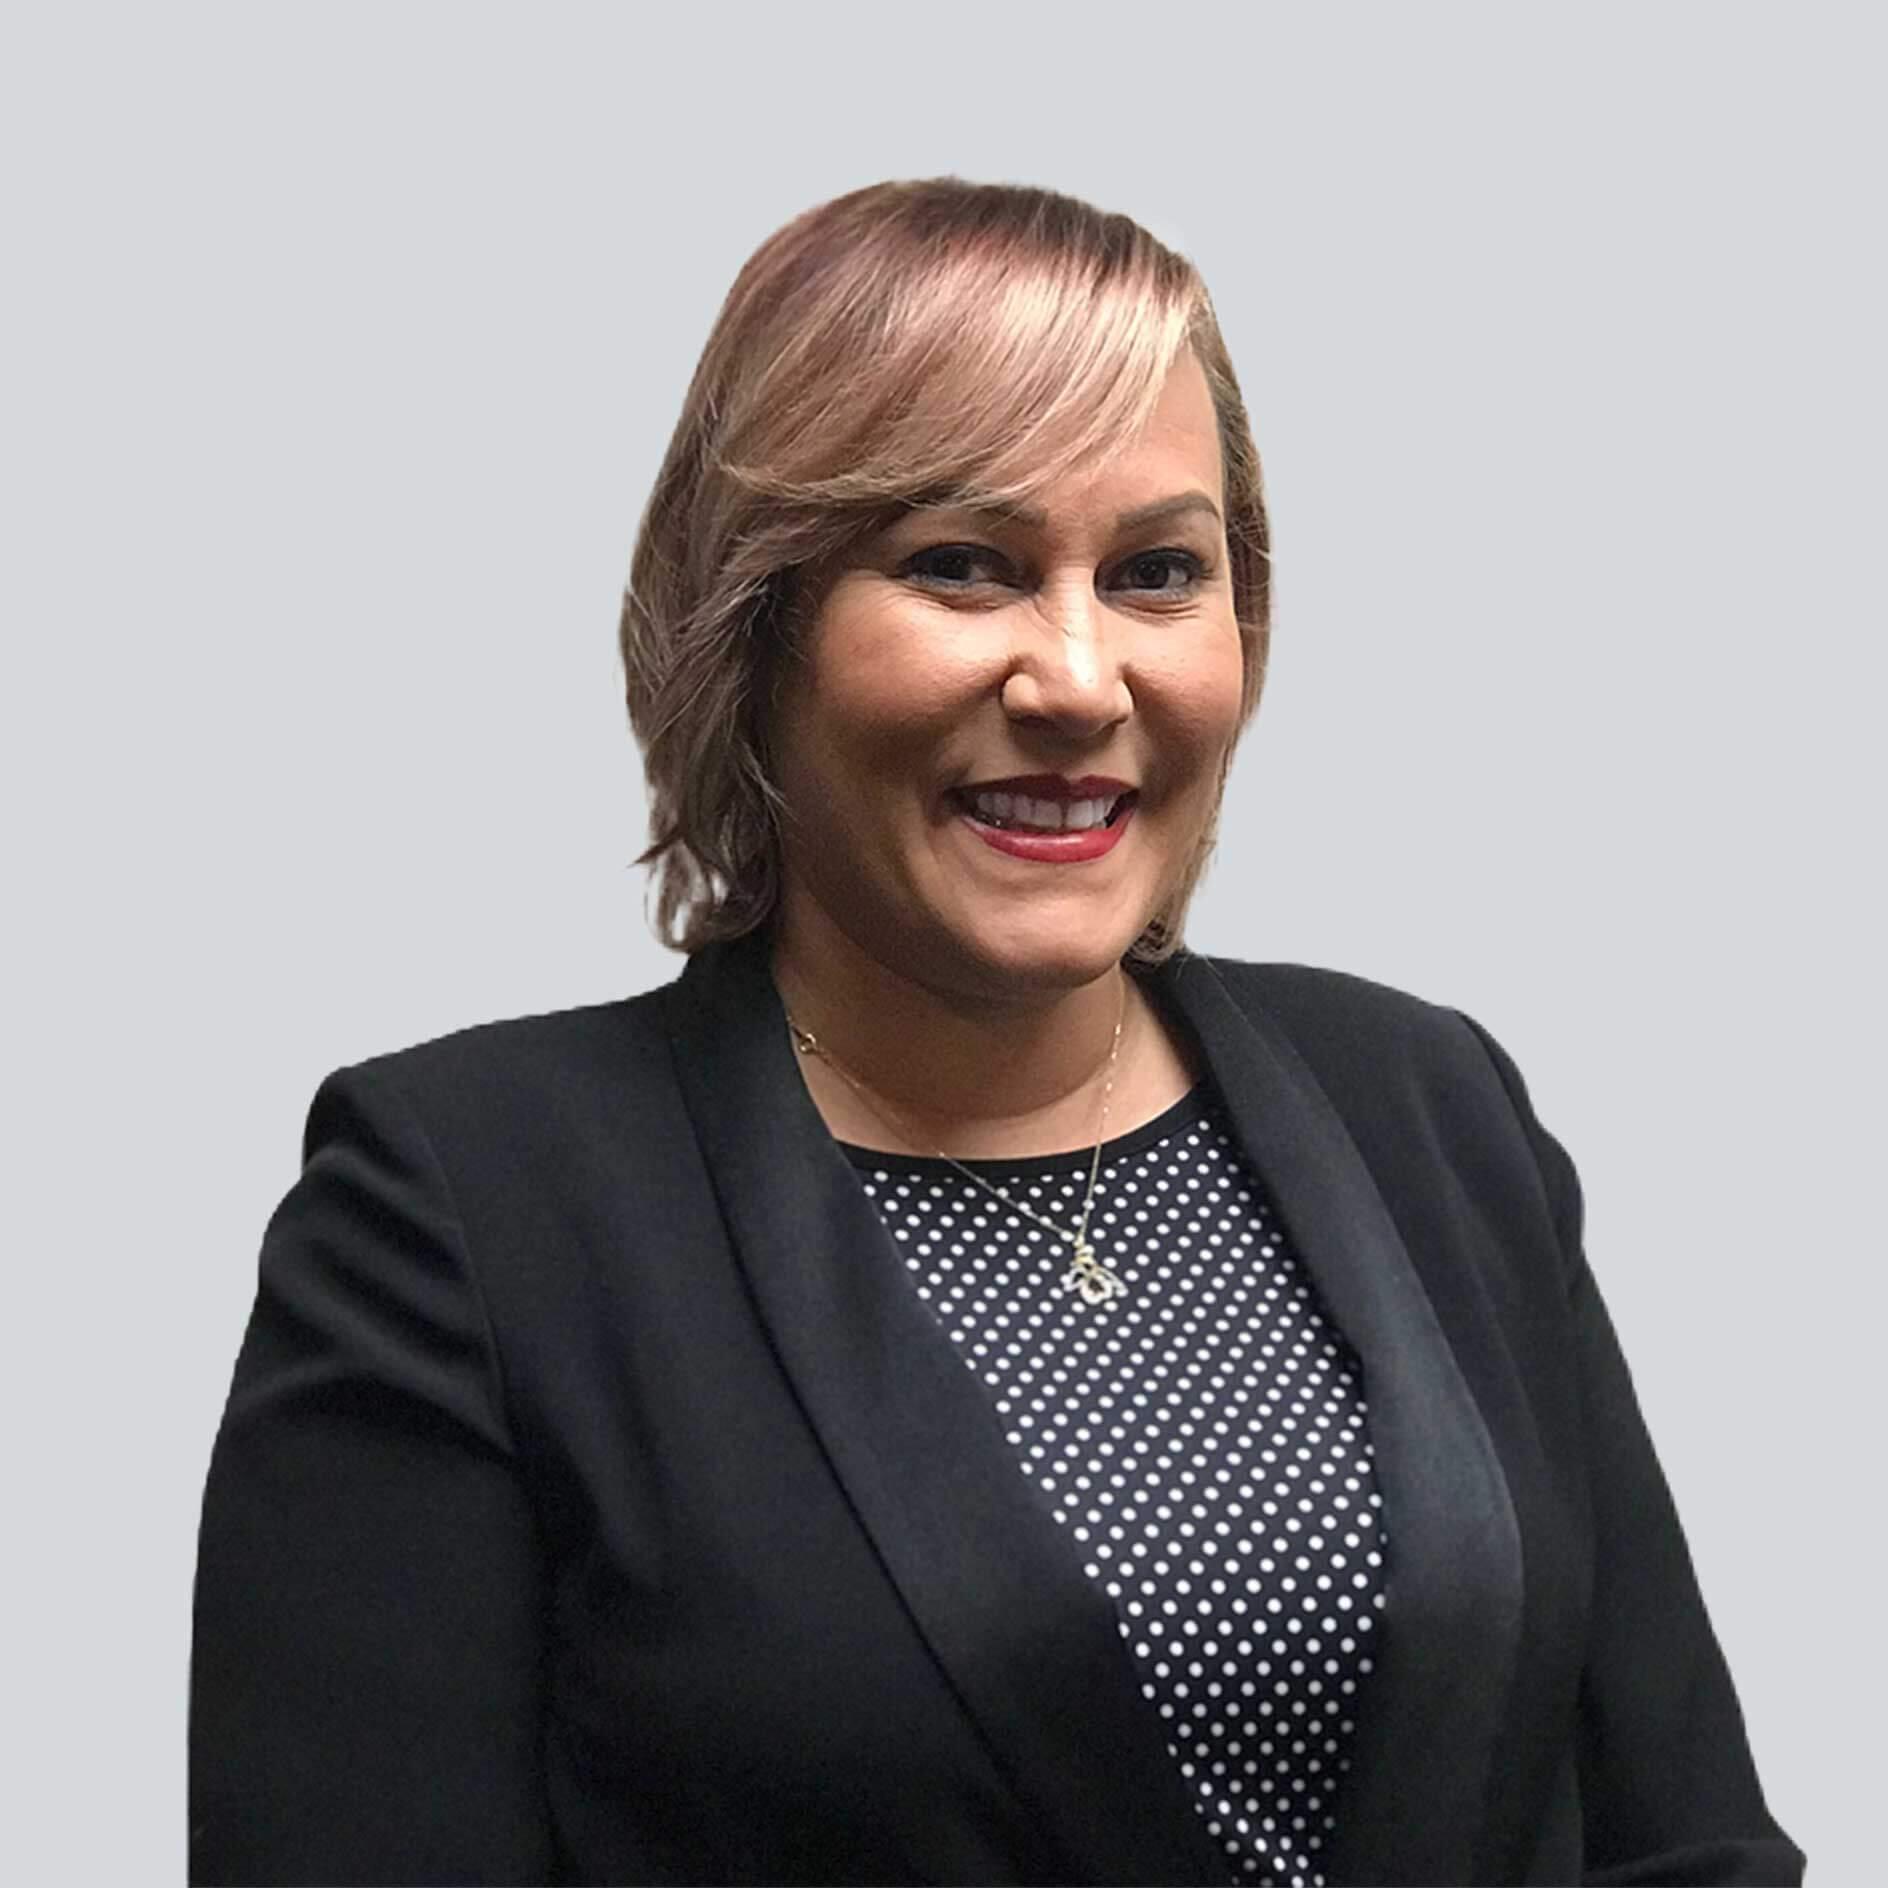 RG Injury Law Bilingual Legal Assistant Jessica Goyco